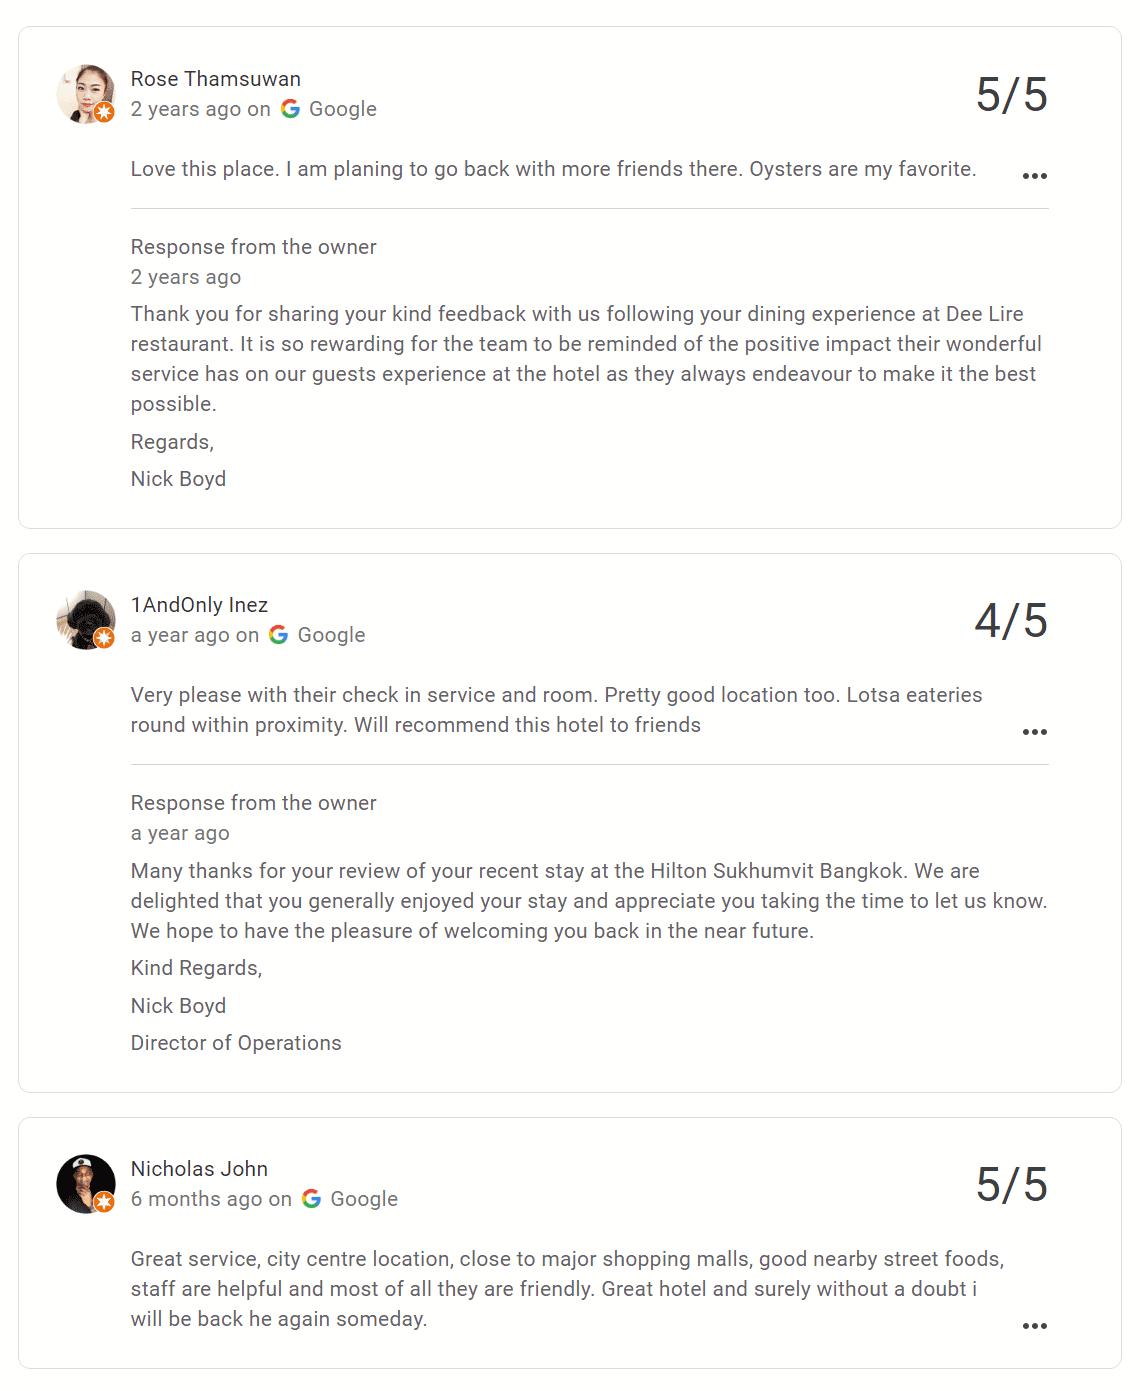 DoubleTree by Hilton Google Reviews